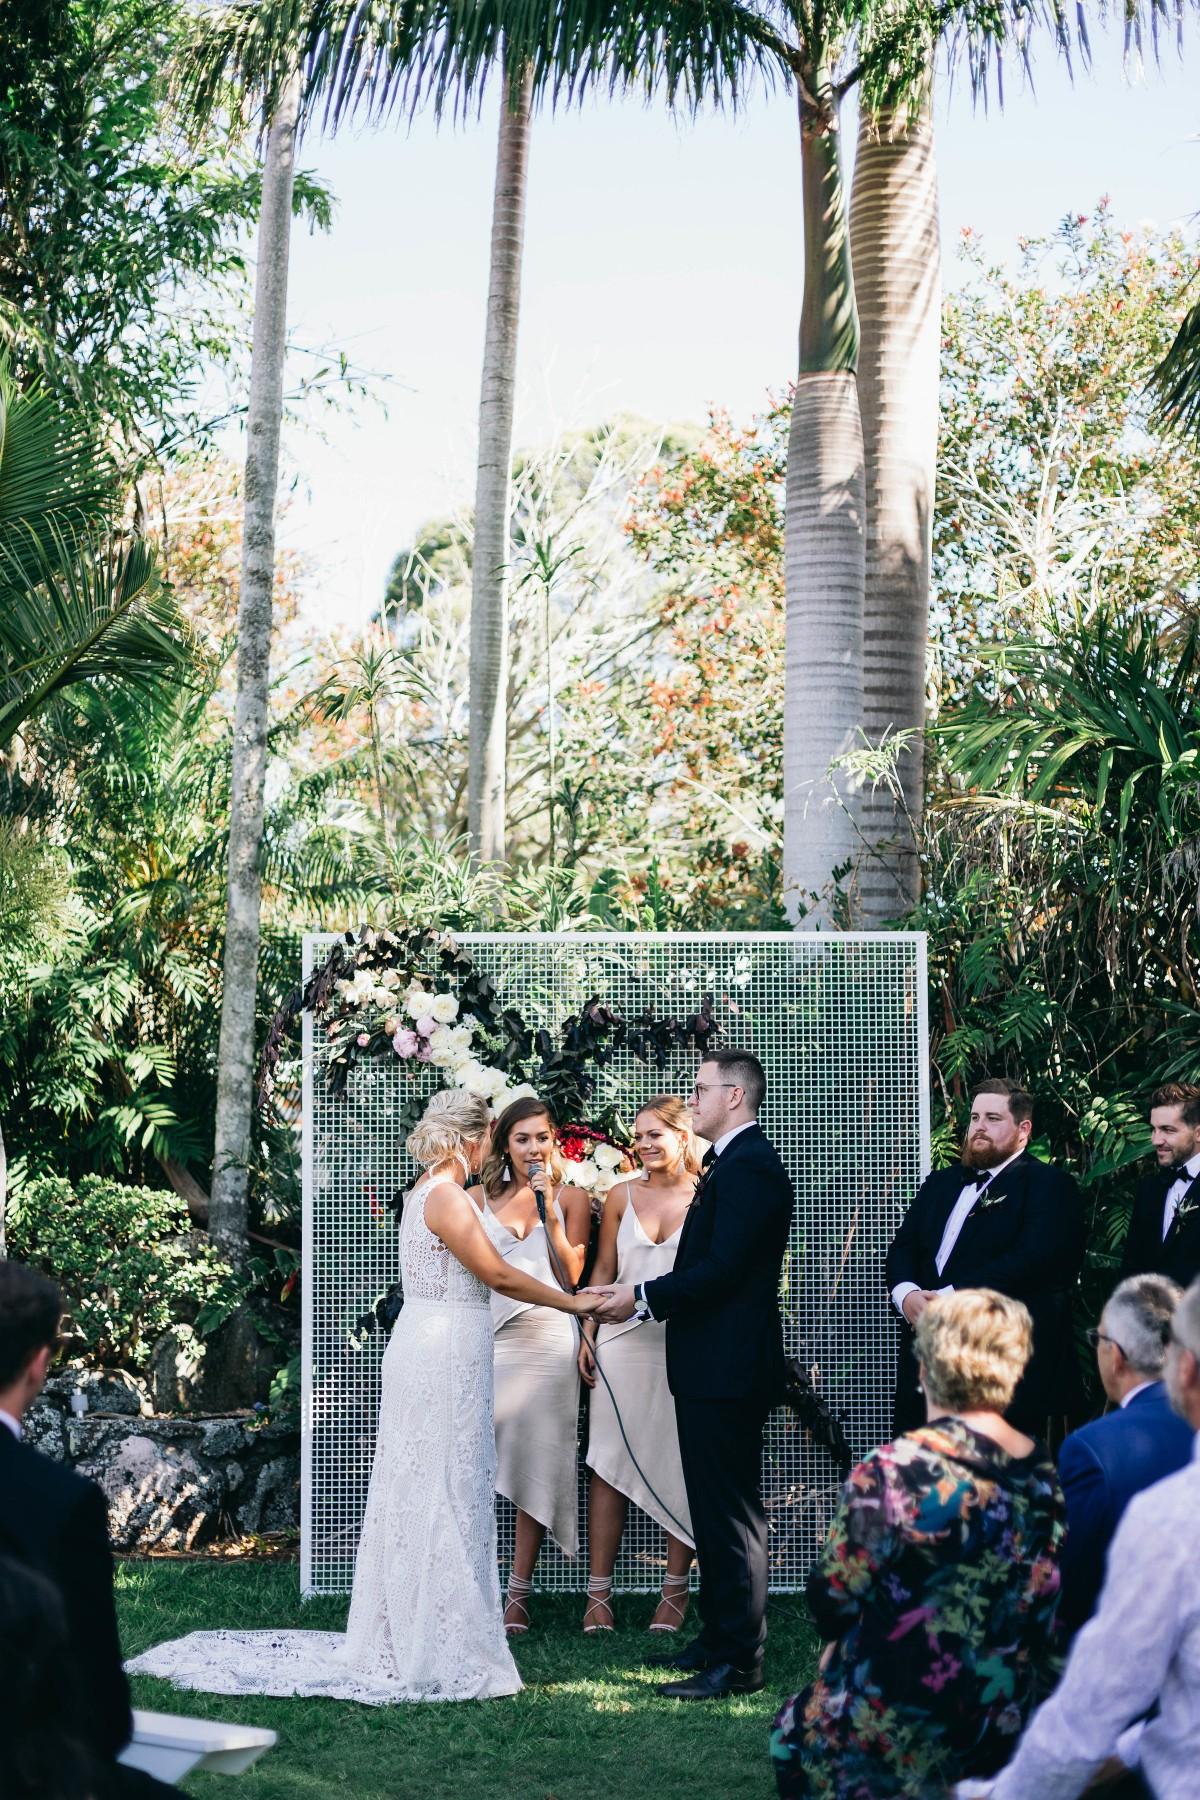 Kathy Glenn Newrybar Byron Bay Wedding Venue Hampton Event Hire24.jpg